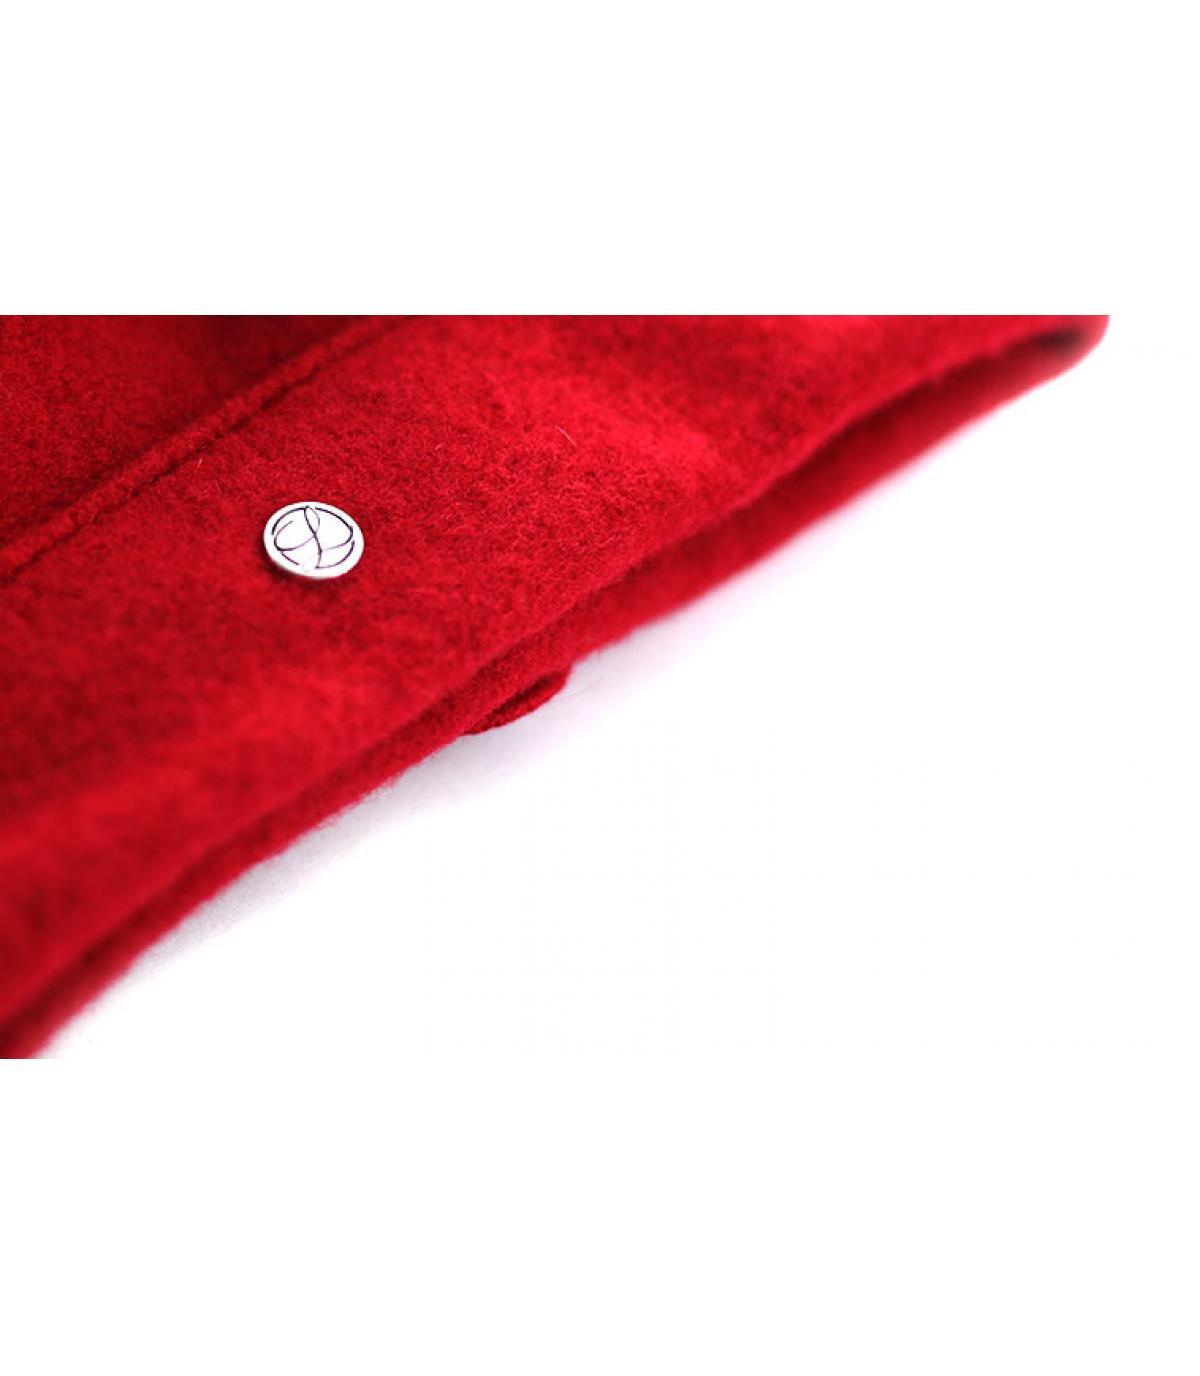 Details Capucine hermès - Abbildung 3